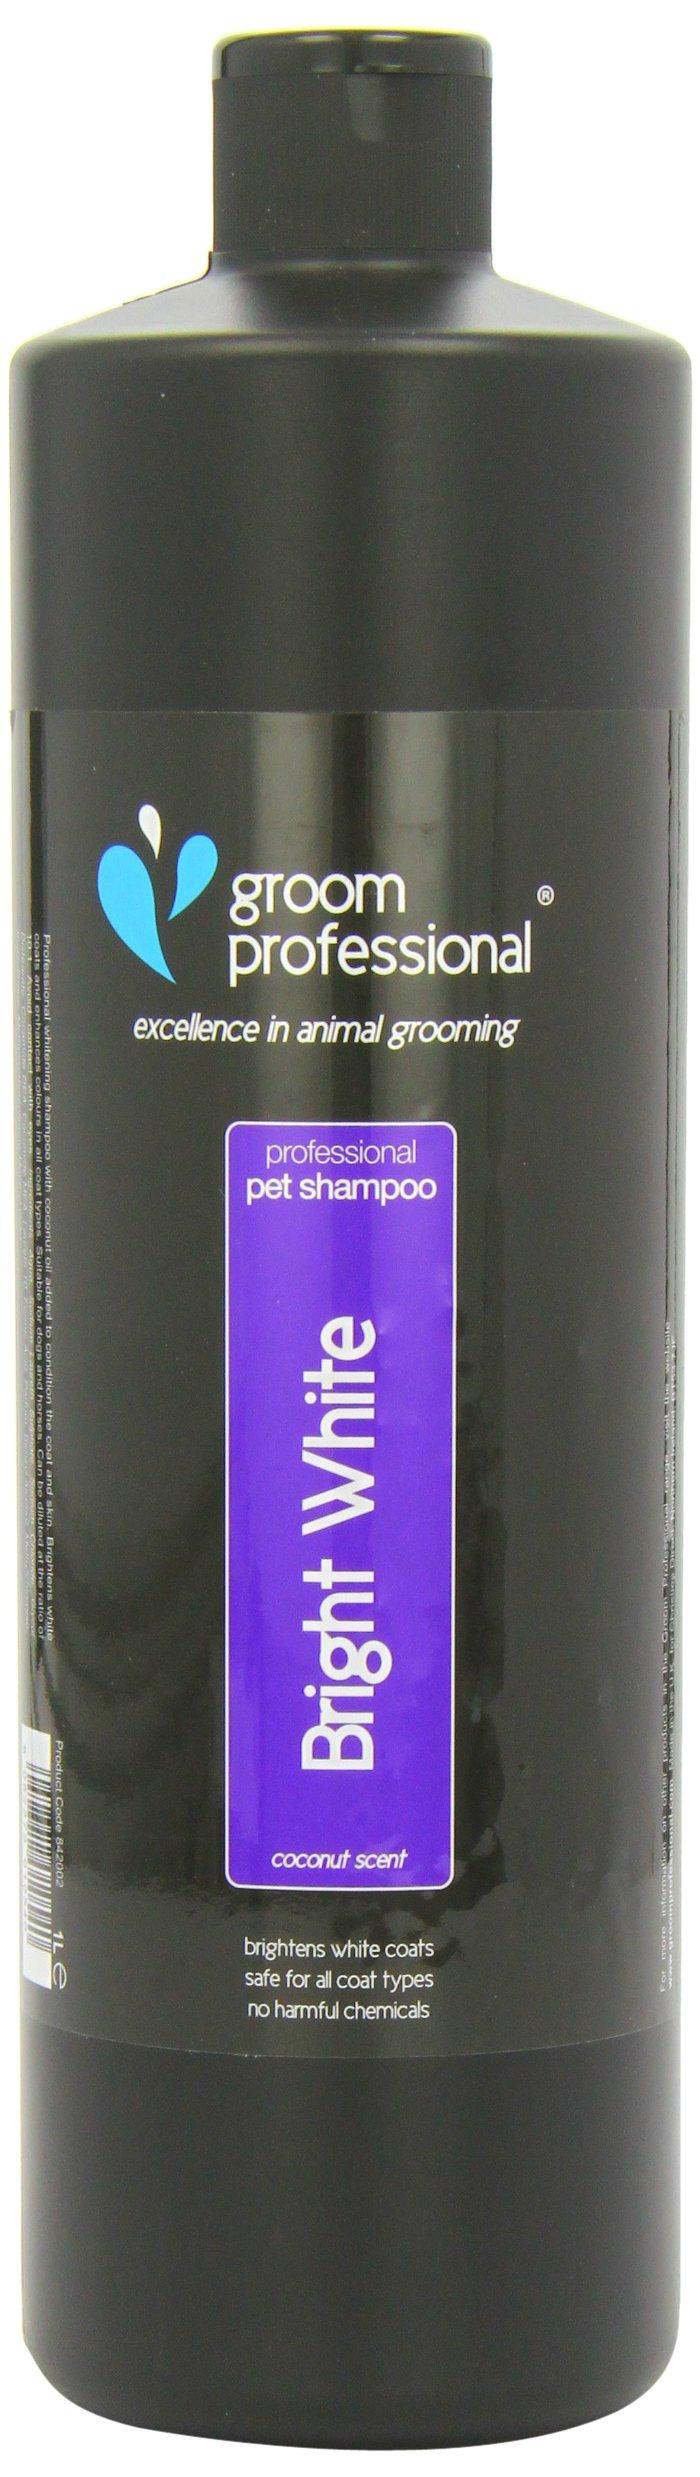 Groom Professional Bright White Shampoo, 1 Litre